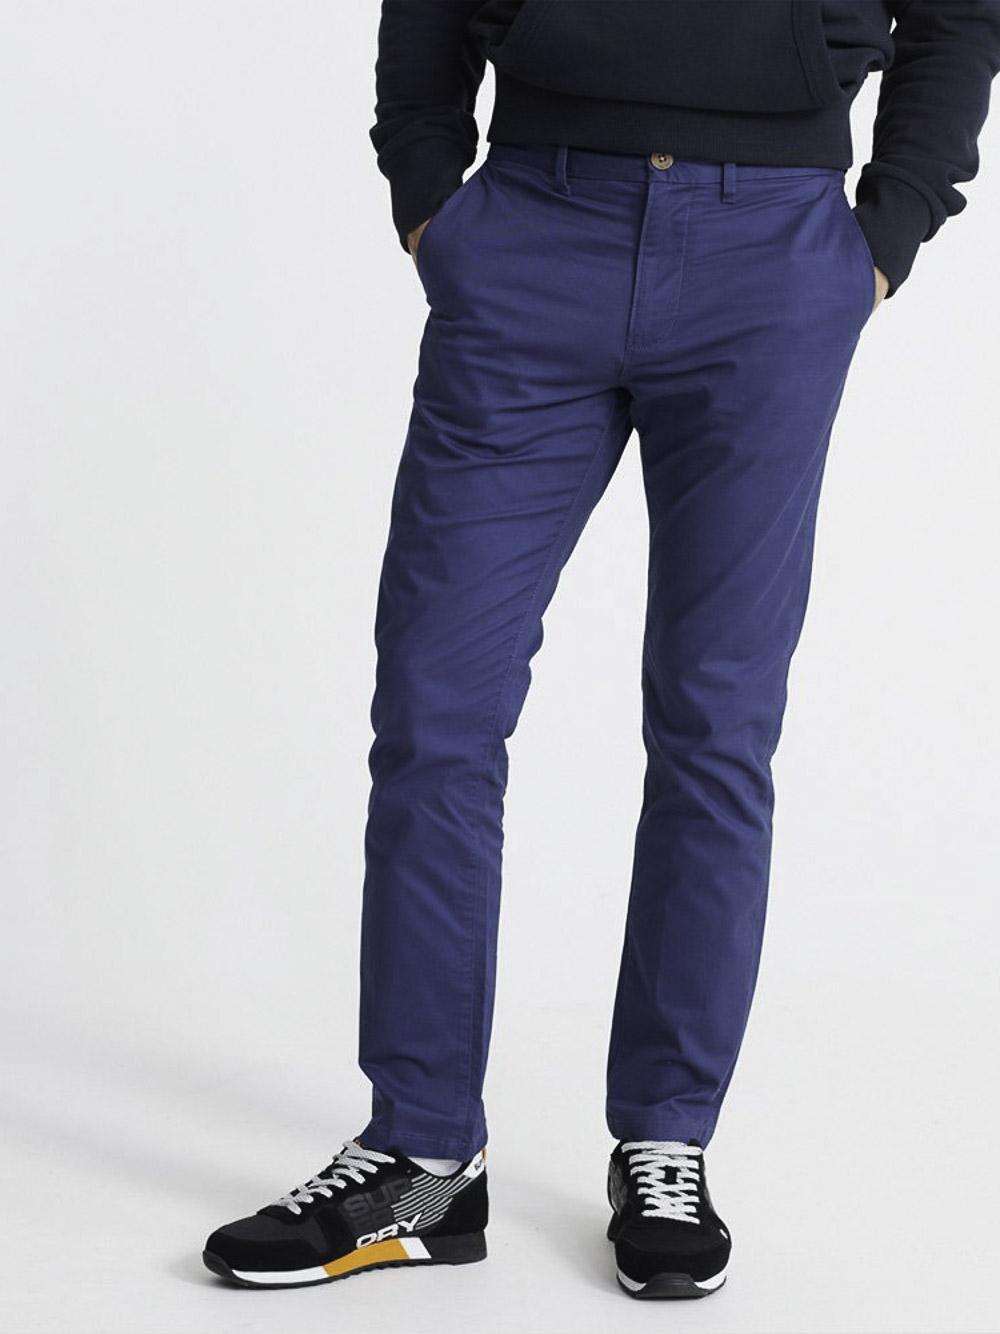 SUPERDRY Παντελόνι chinos M7010463A-P74 ΜΠΛΕ